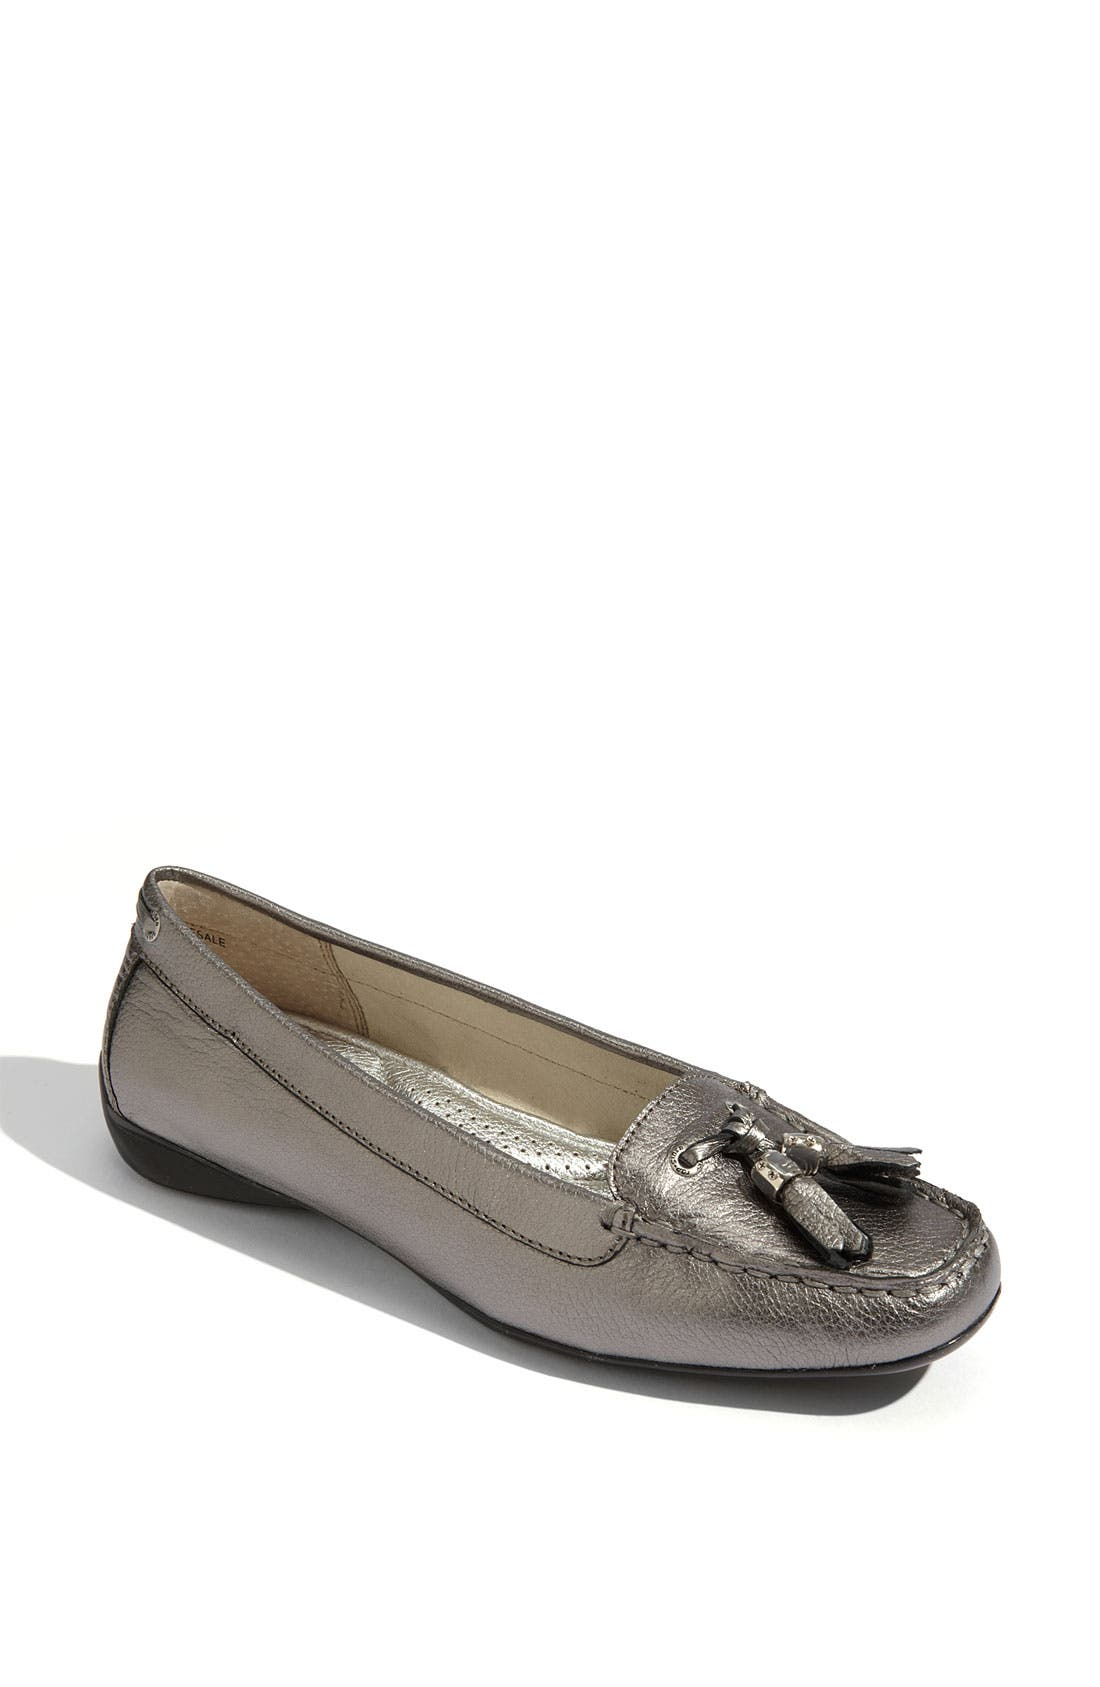 Alternate Image 1 Selected - Sperry Top-Sider® 'Brantpoint' Metallic Loafer